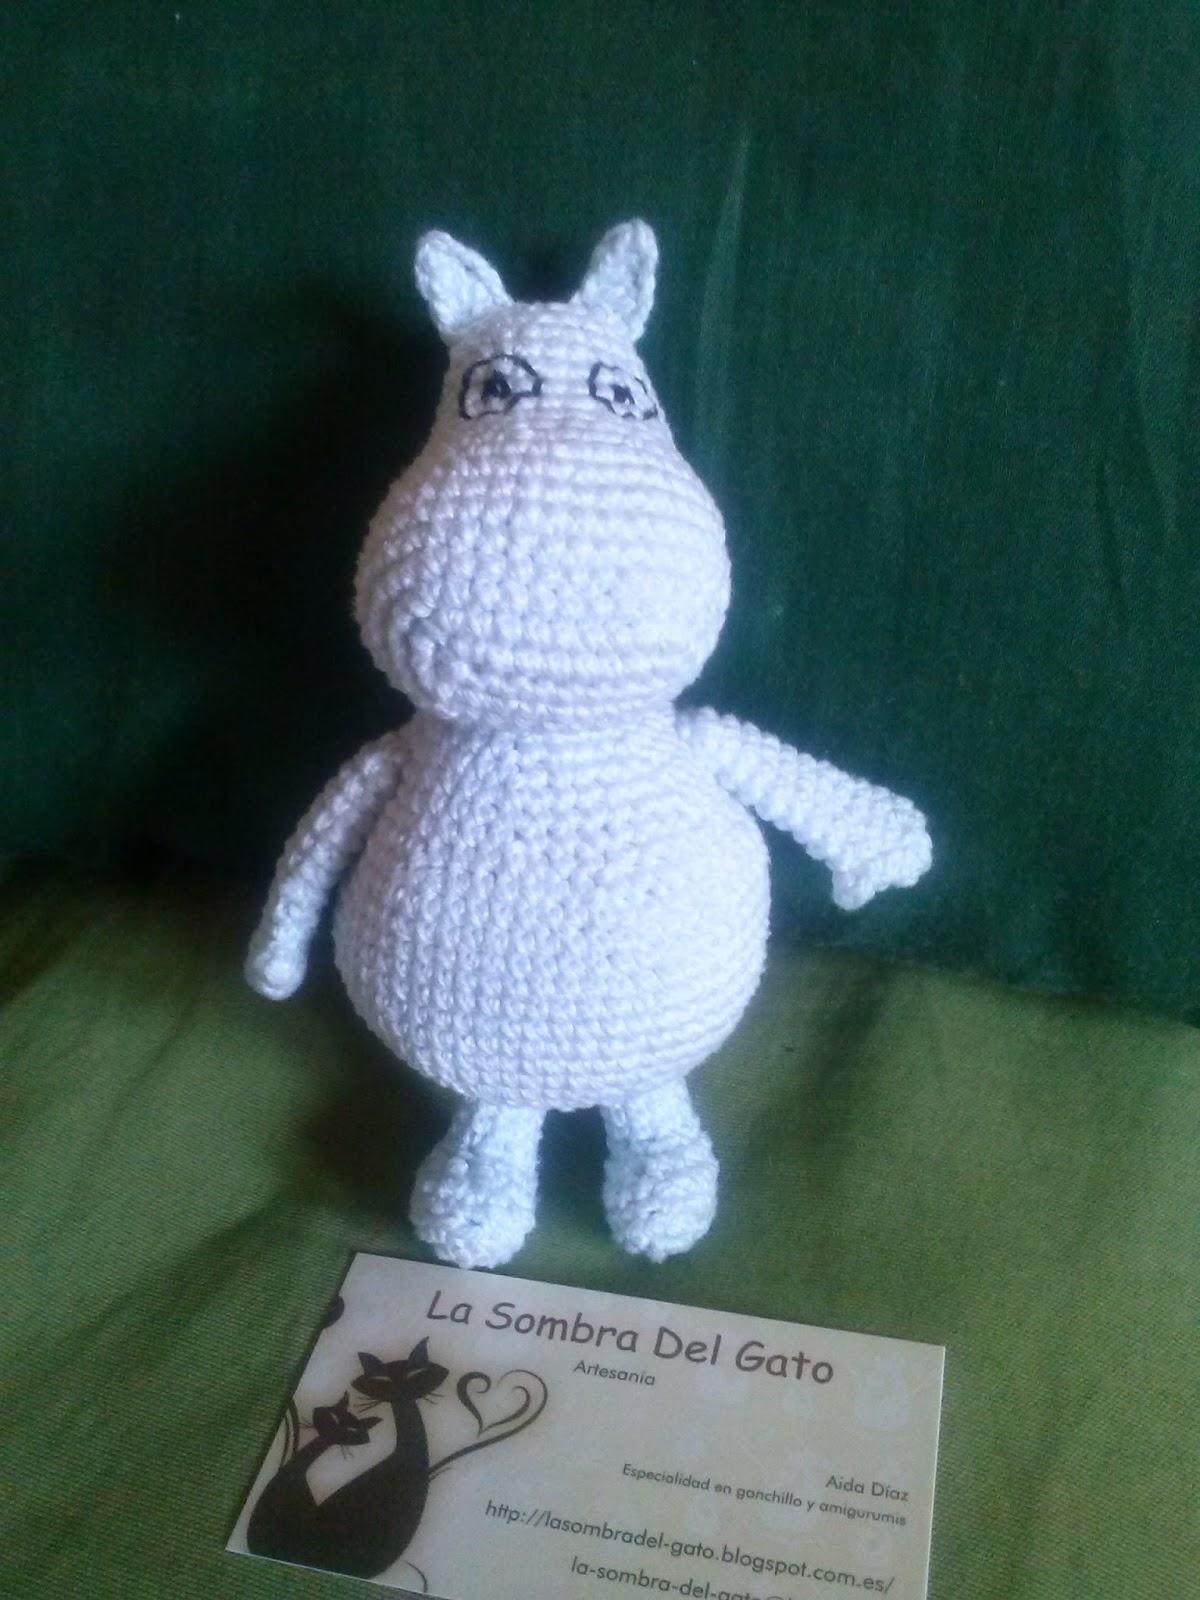 La sombra del gato: Moomin